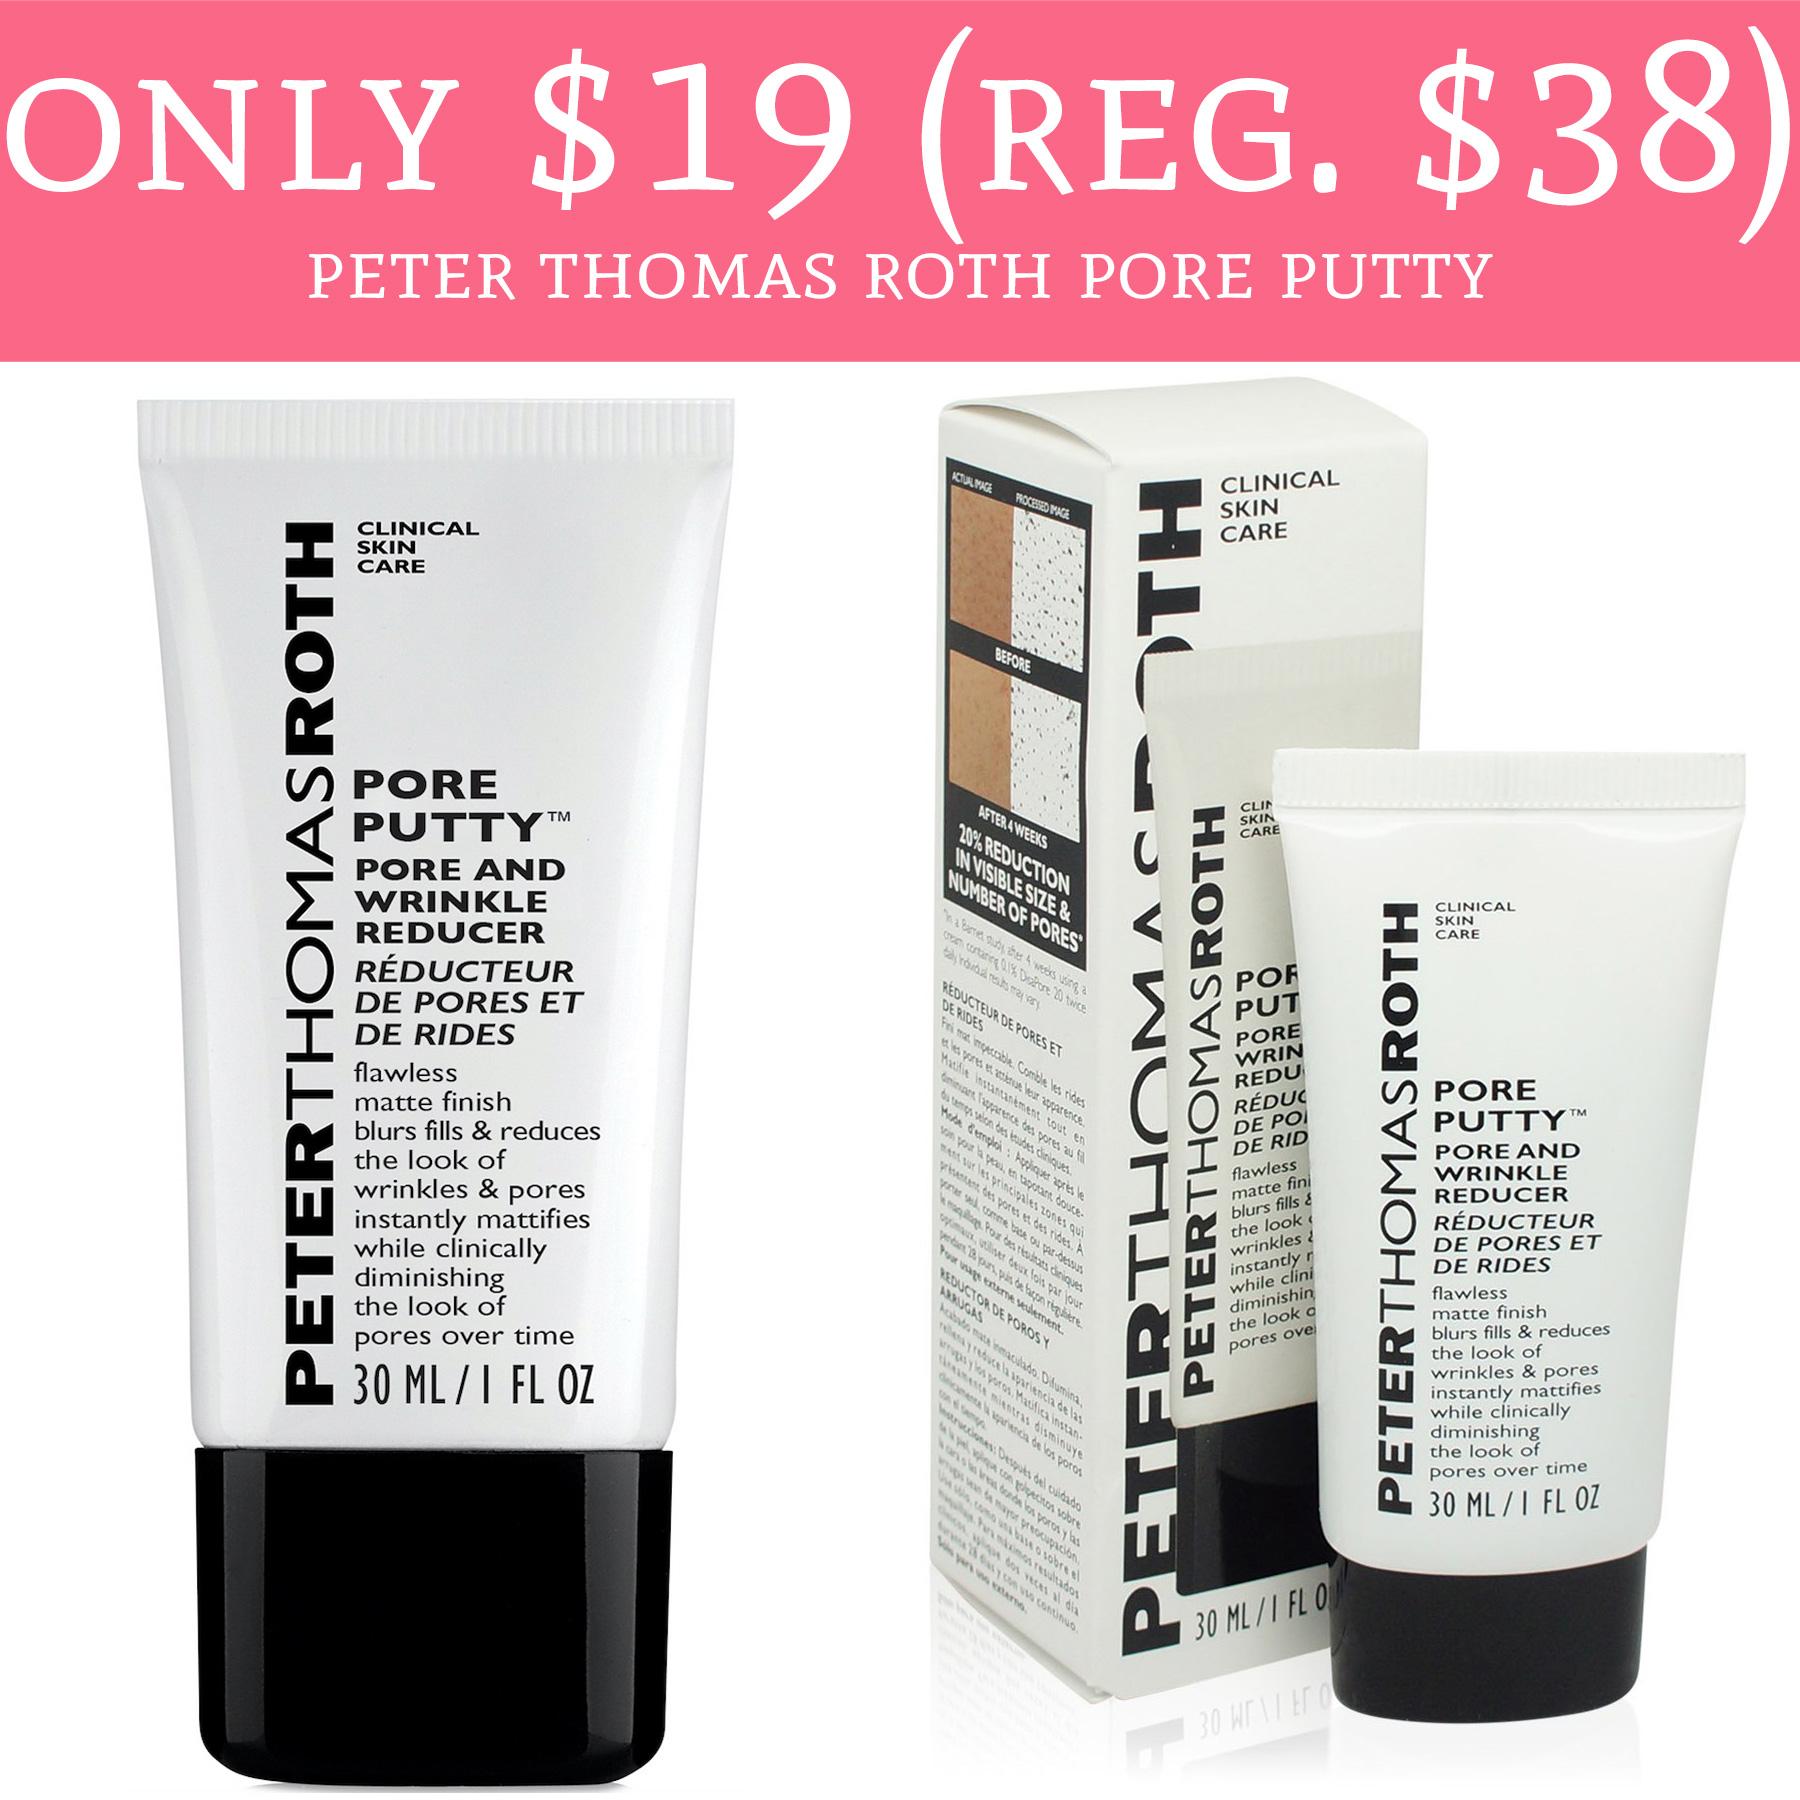 peter thomas roth pore putty